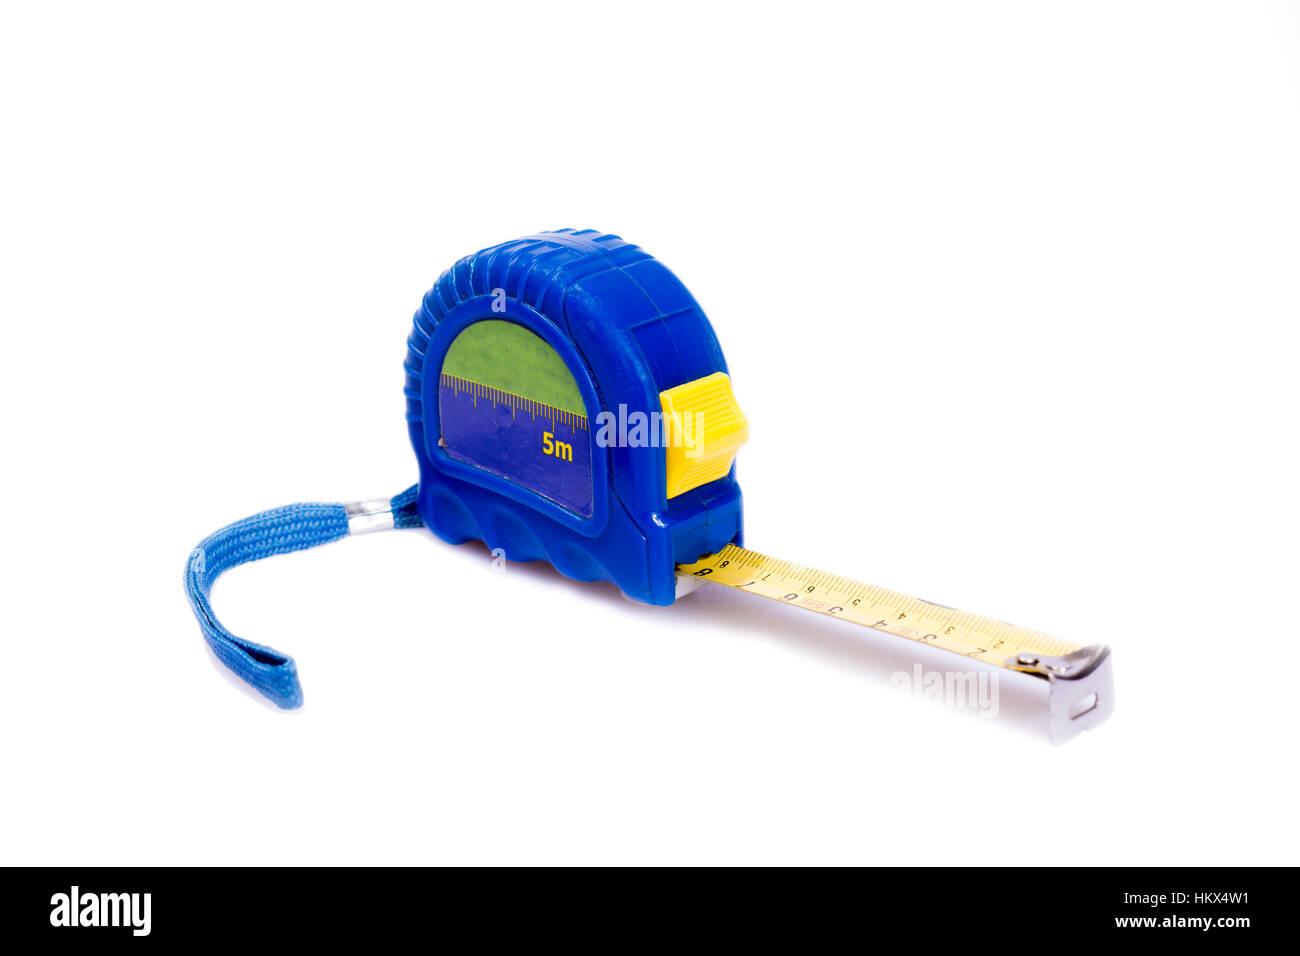 Tape measure isolated on white background. - Stock Image